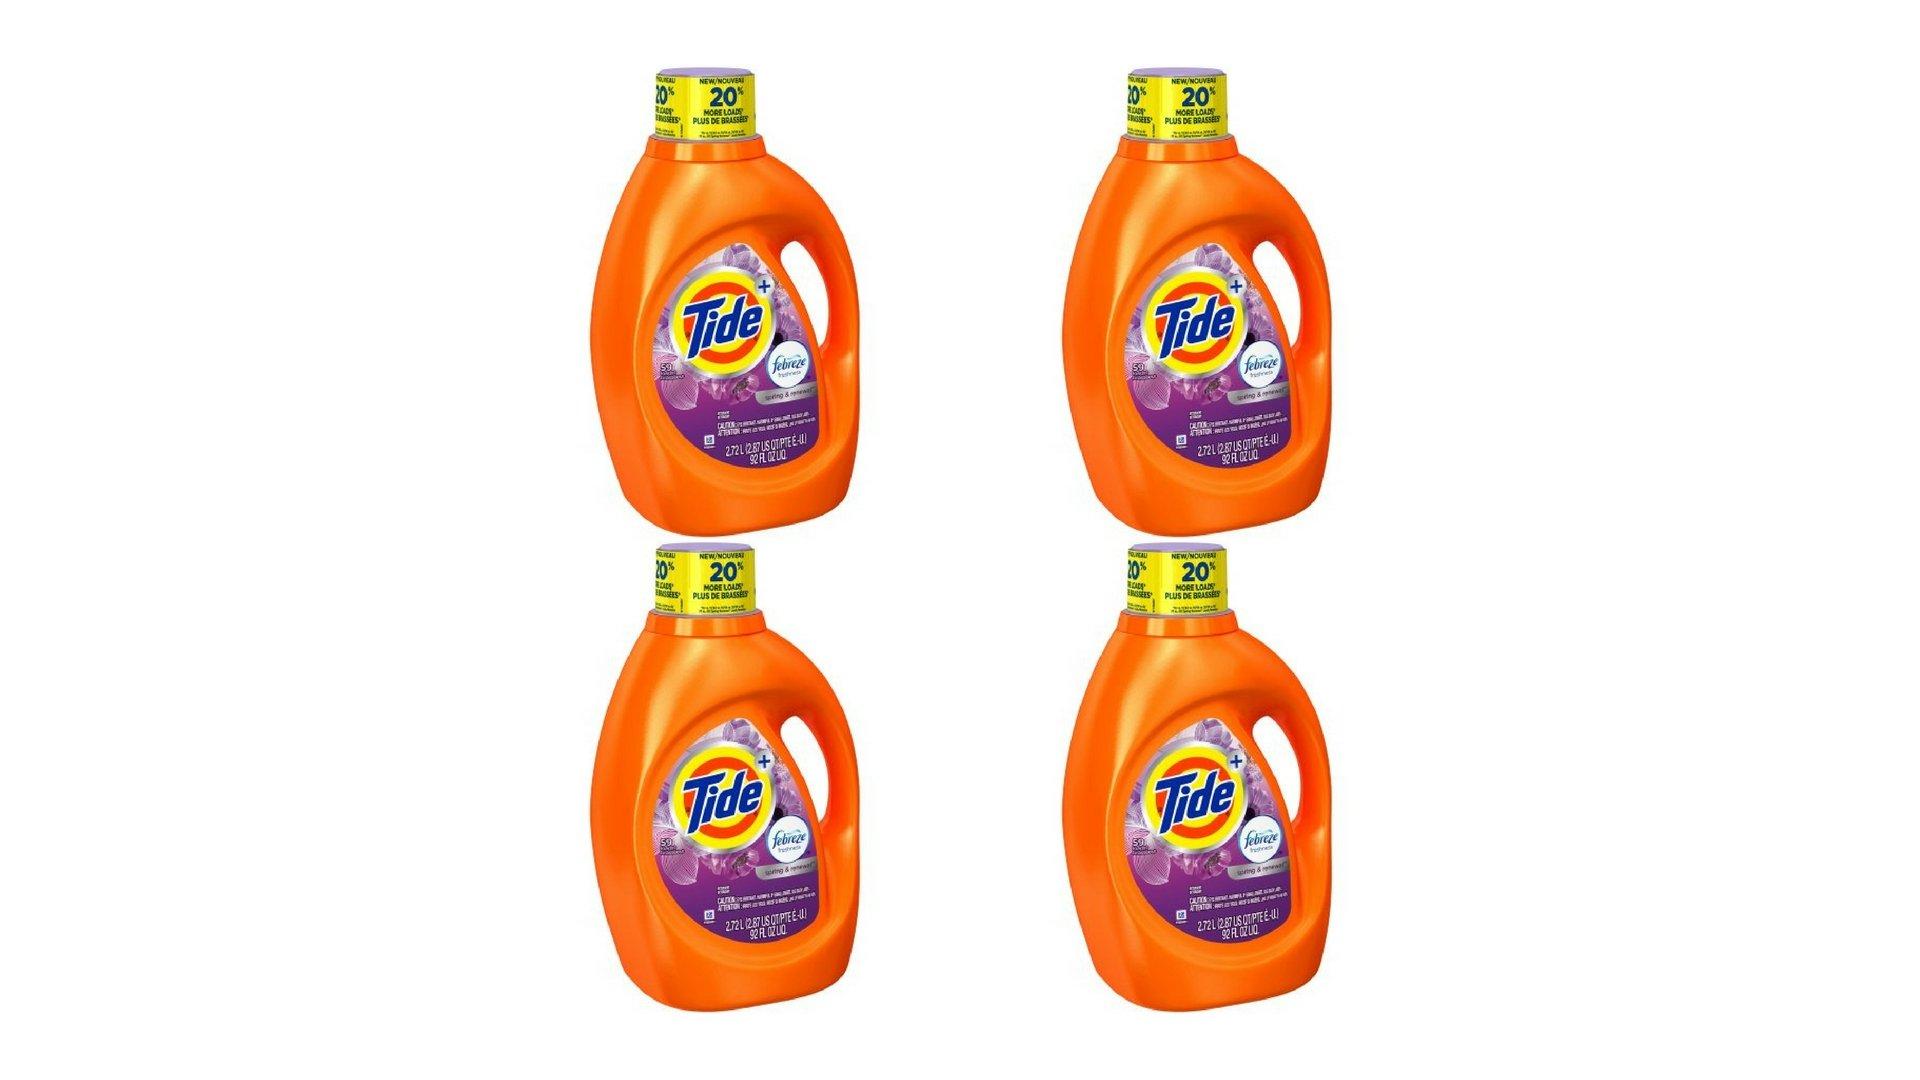 Tide Plus Febreze Freshness Spring and Renewal Scent Liquid Laundry Detergent 92 fl oz per bottle set of 4